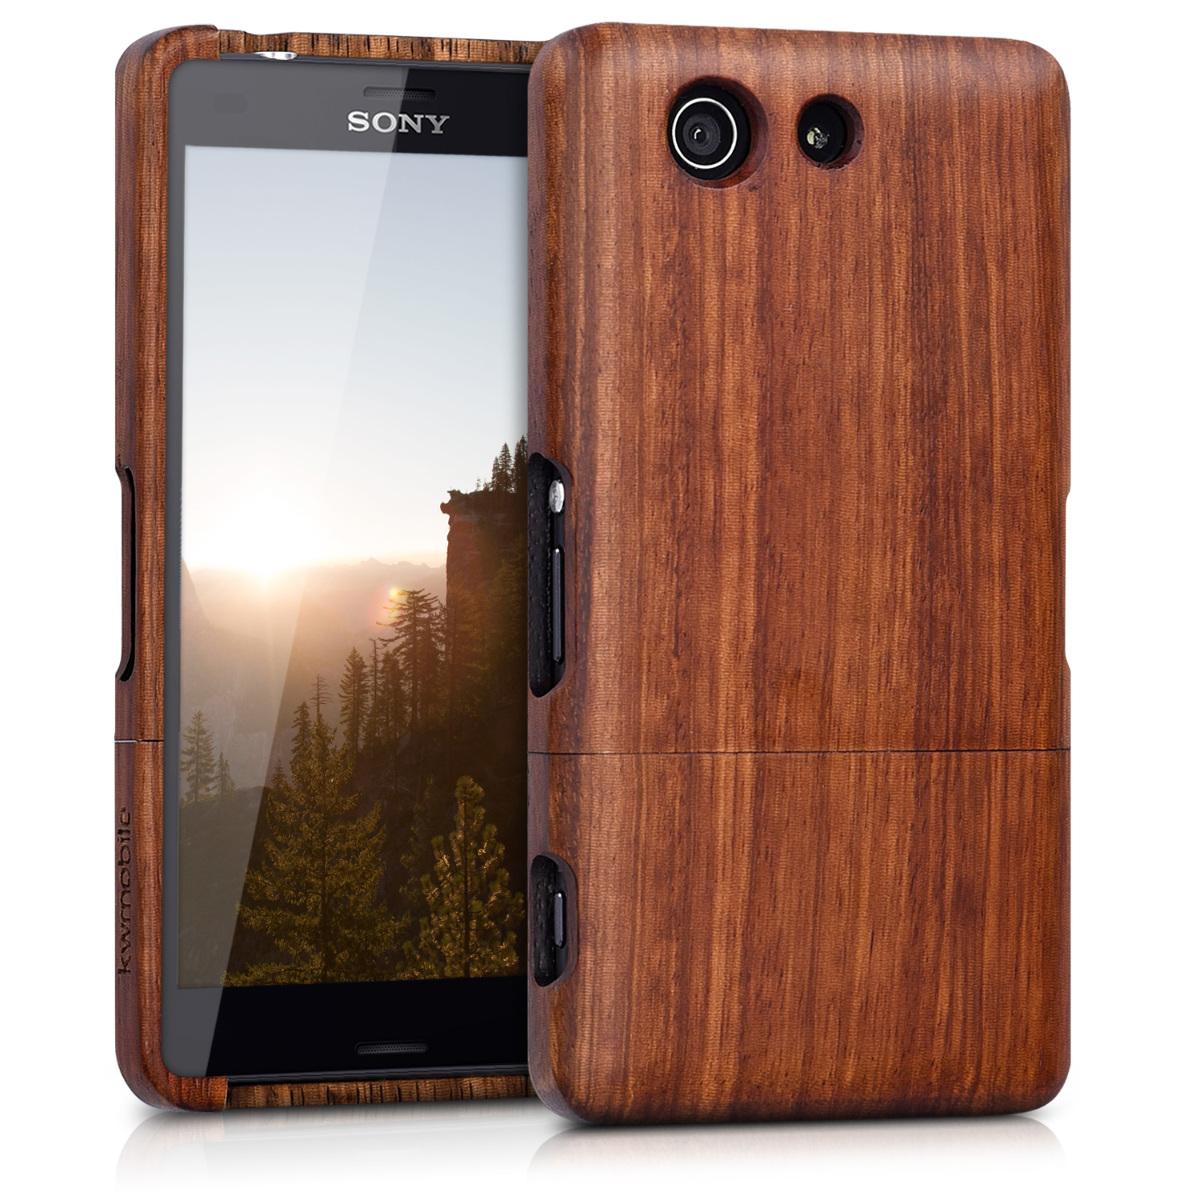 KW Ξύλινη Θήκη Sony Xperia Z3 Compact - Rosewood brown (24719.05)